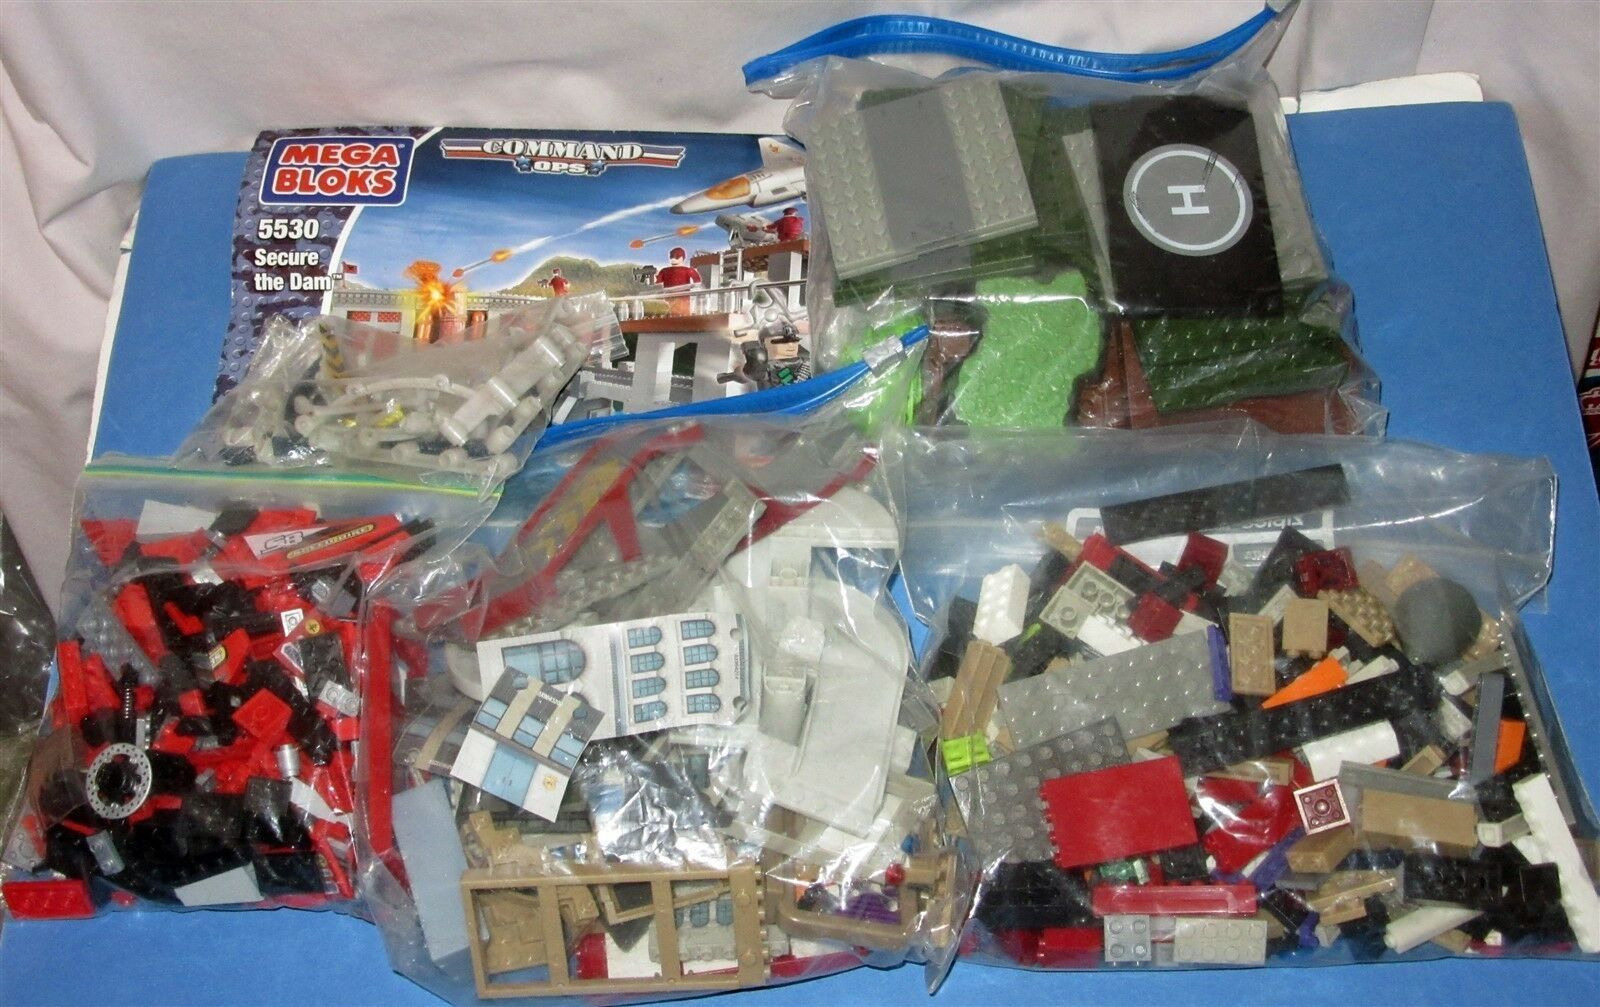 Over 3.5 LBS LBS LBS Mega Bloks Bulk Pieces Parts Lot, 2 micro cars, 1 manual 6696dc